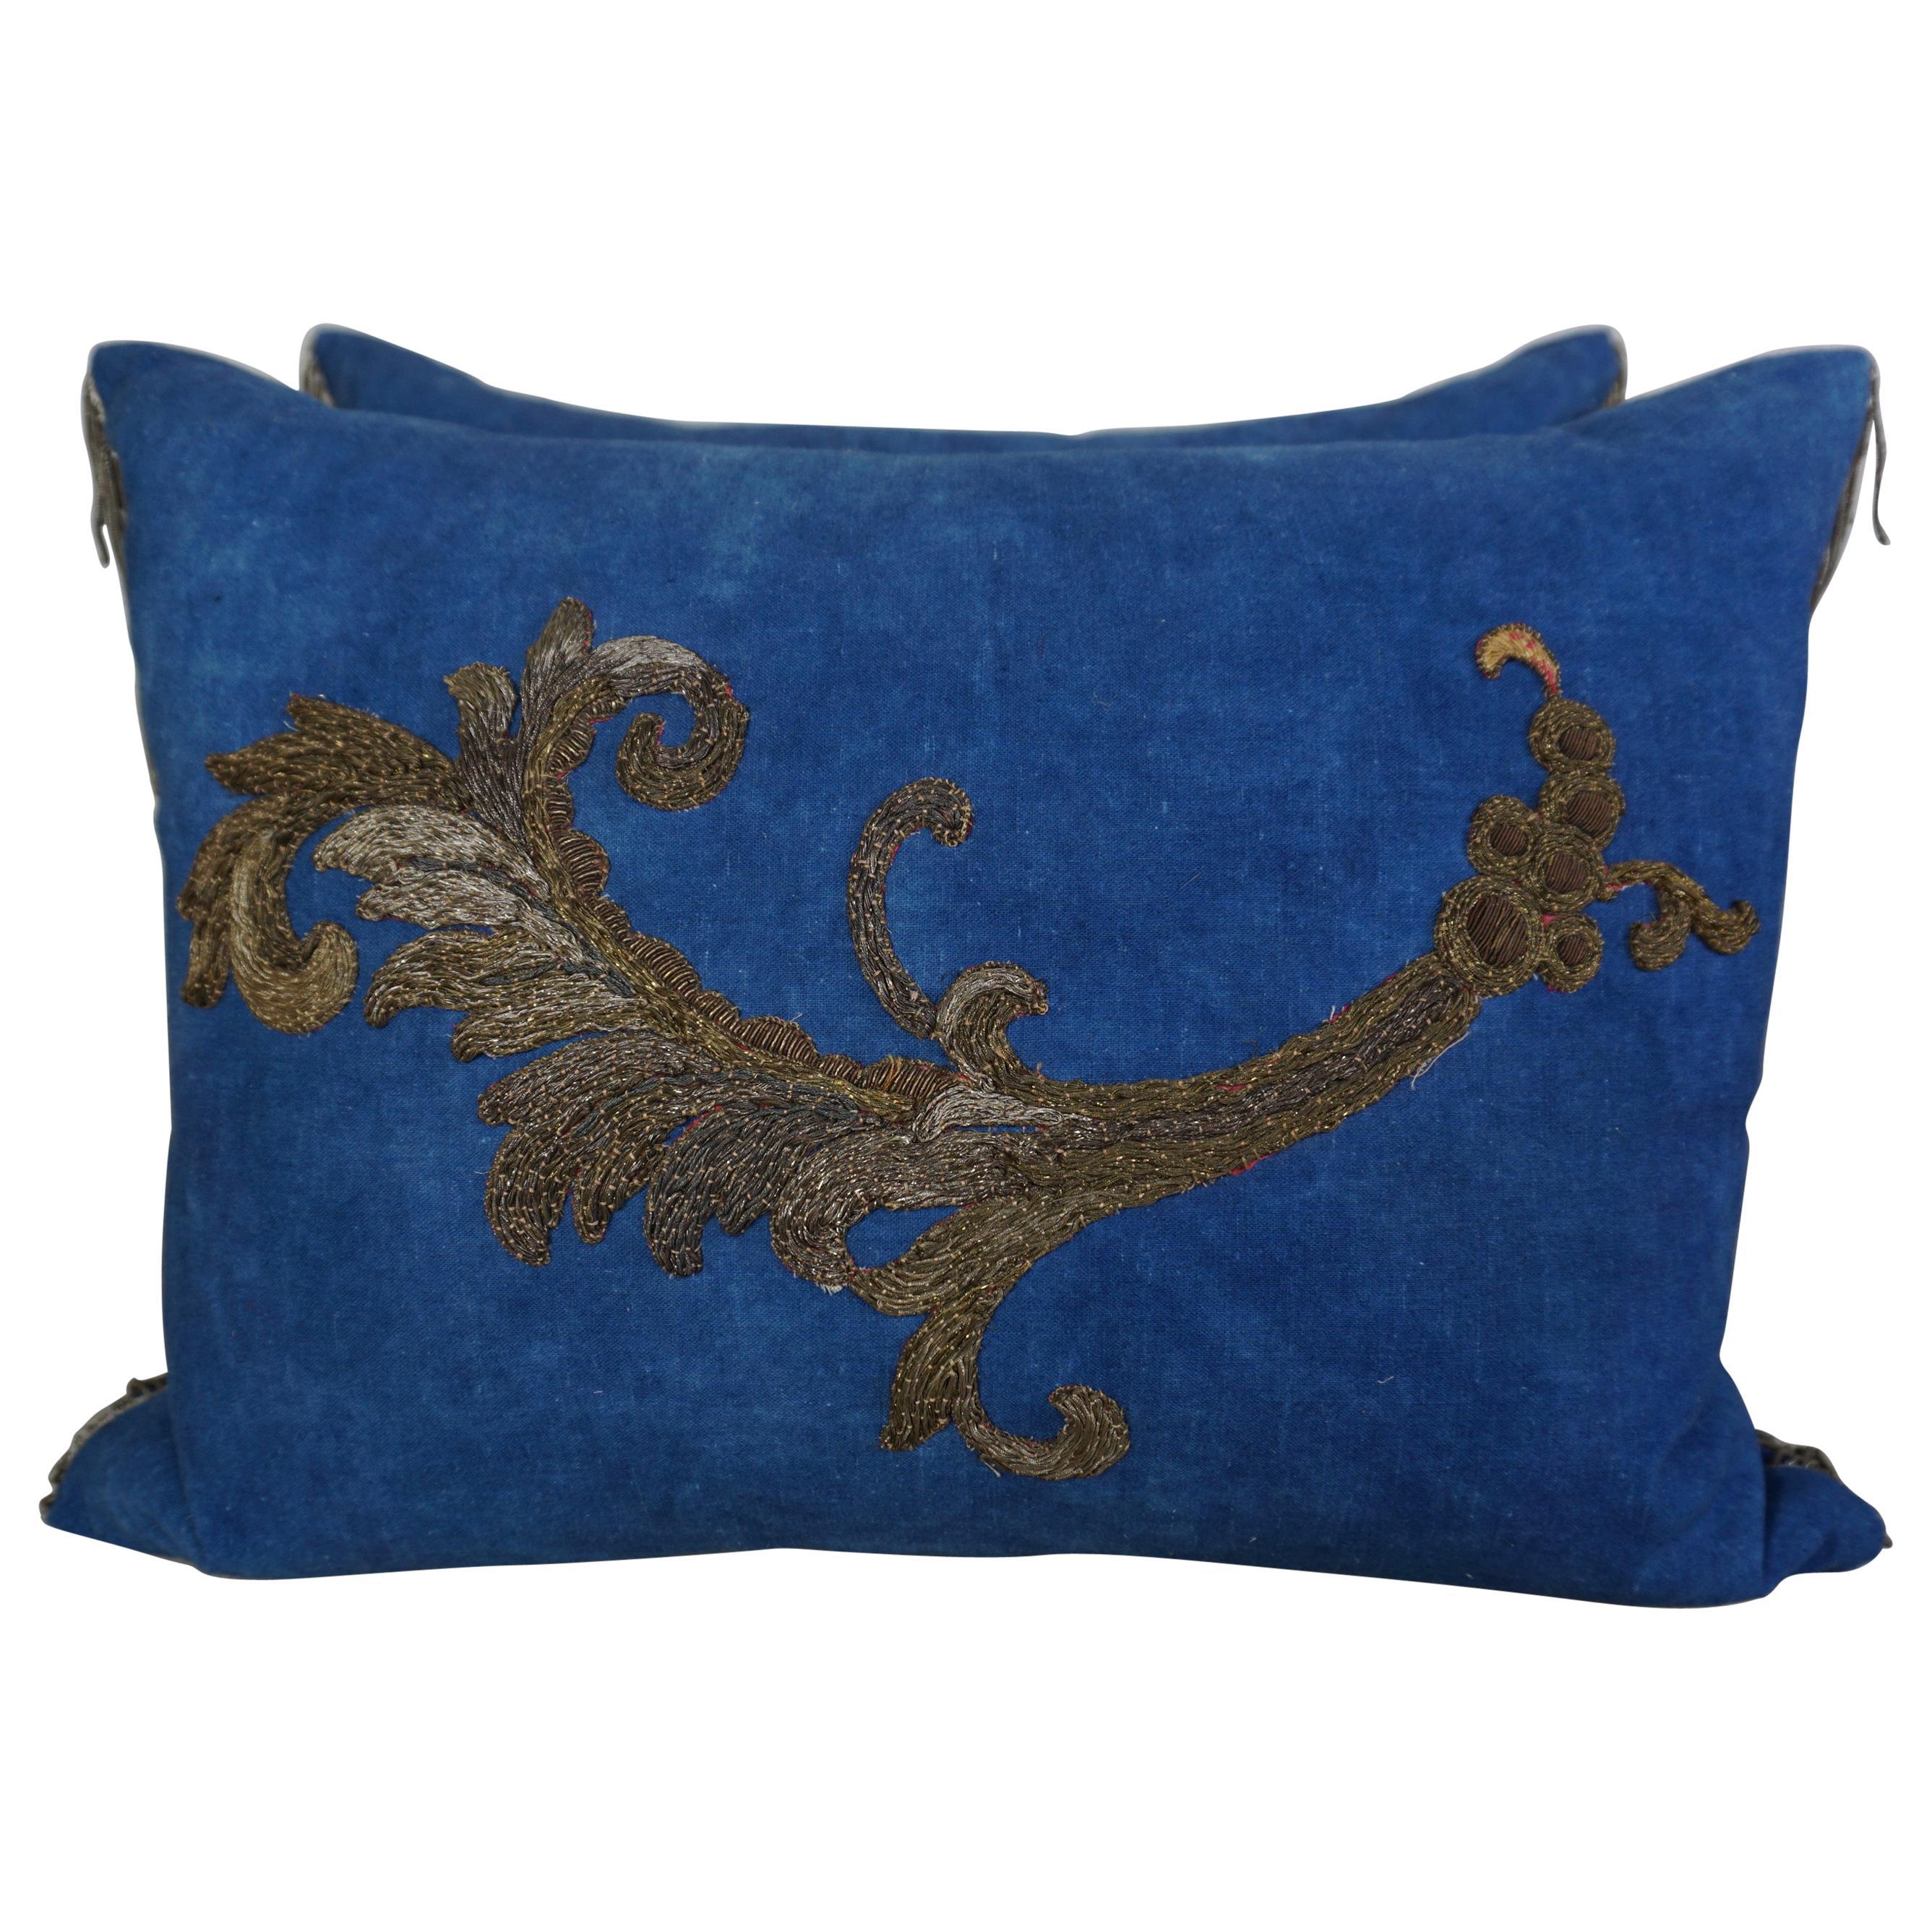 Pair of 19th Century Metallic Applique Pillows by Melissa Levinson